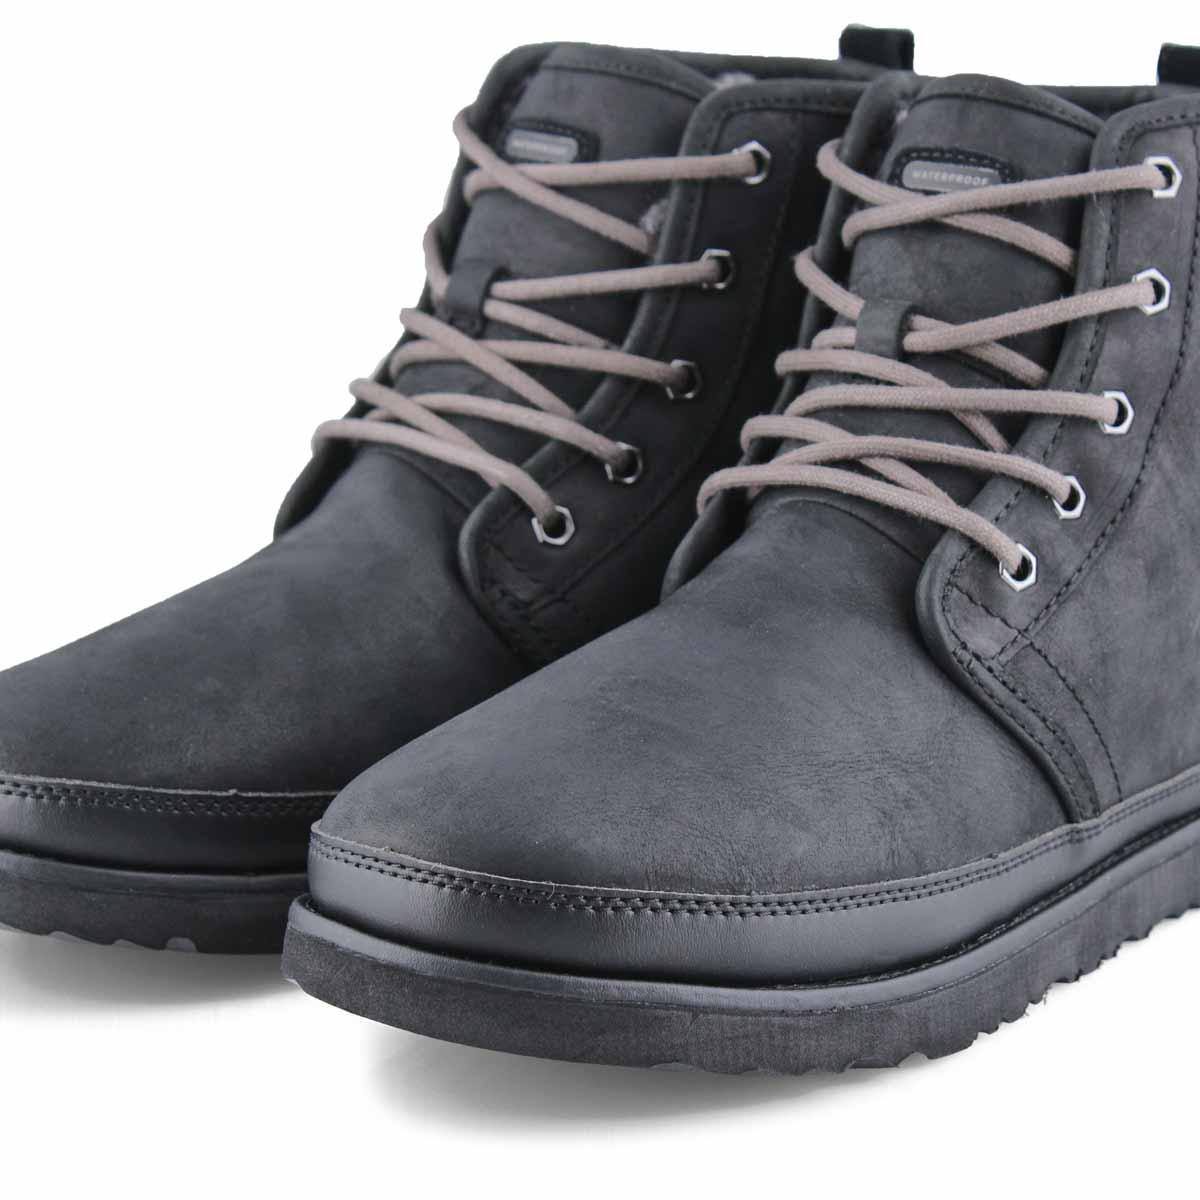 Men's Harkley Lace Up Waterproof Ankle Boot - Blk